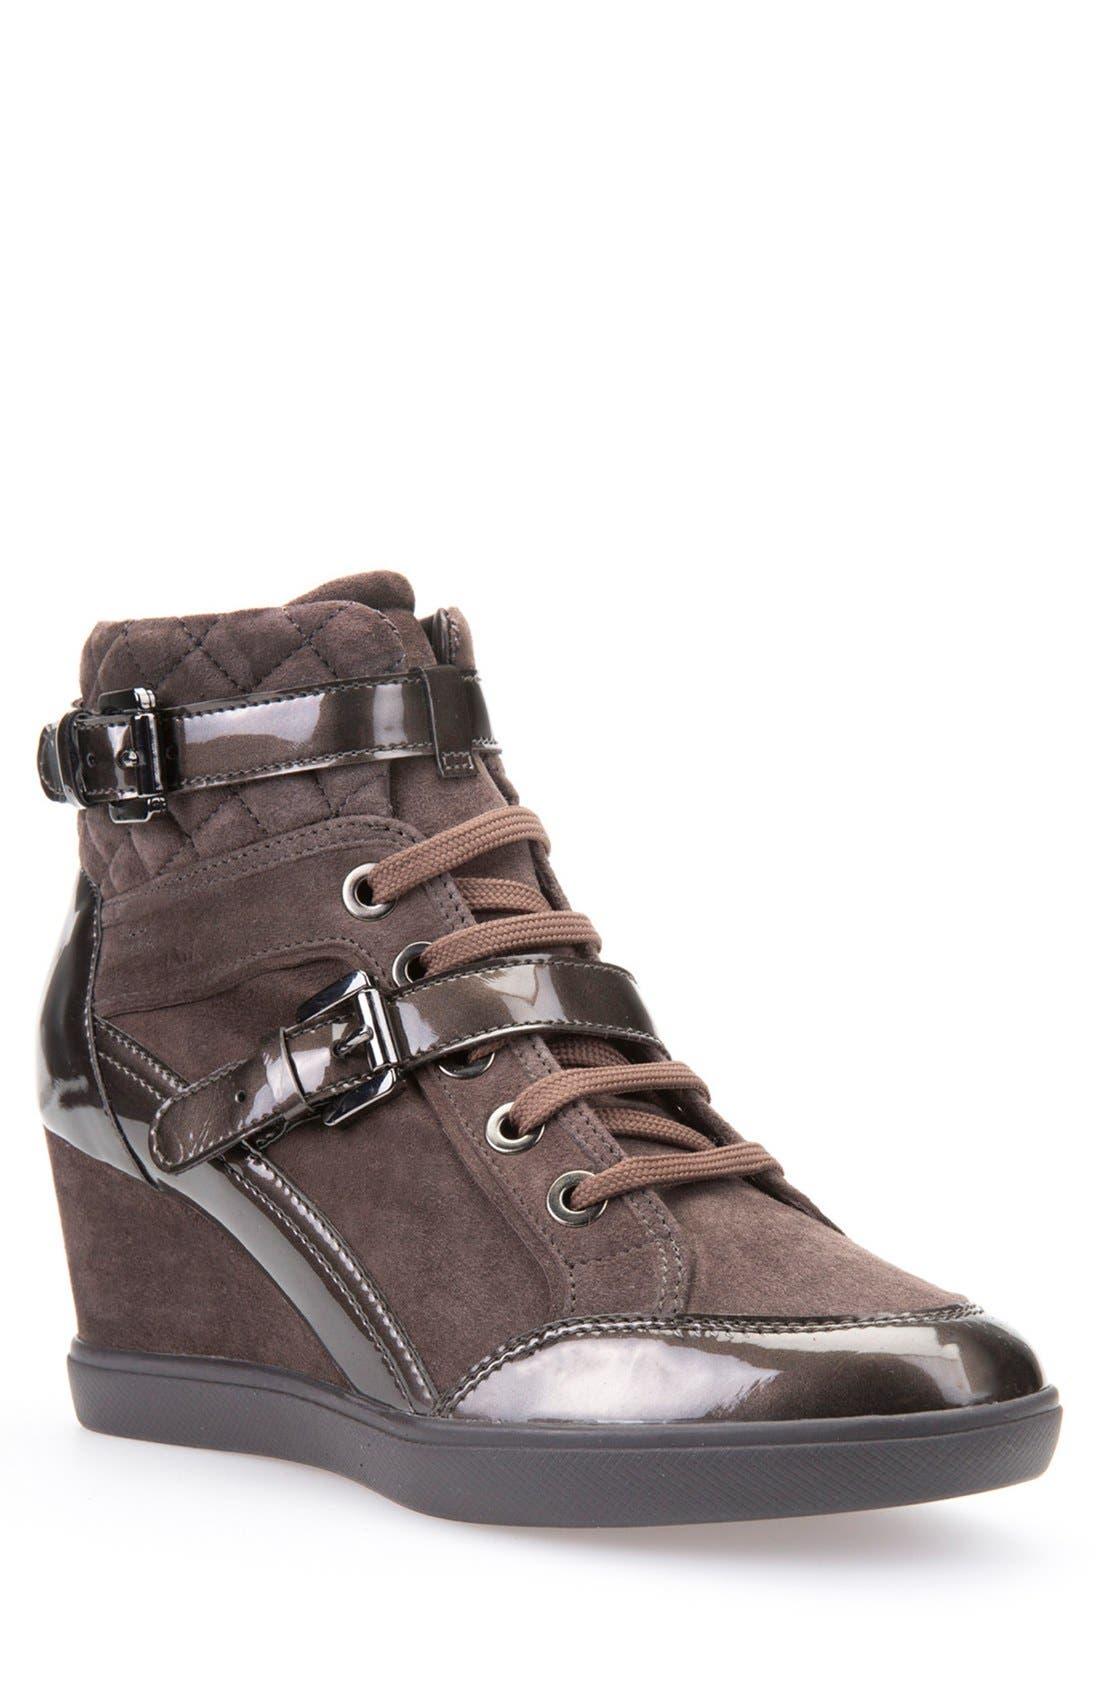 'Eleni' Wedge Sneaker,                             Main thumbnail 1, color,                             Chestnut Suede